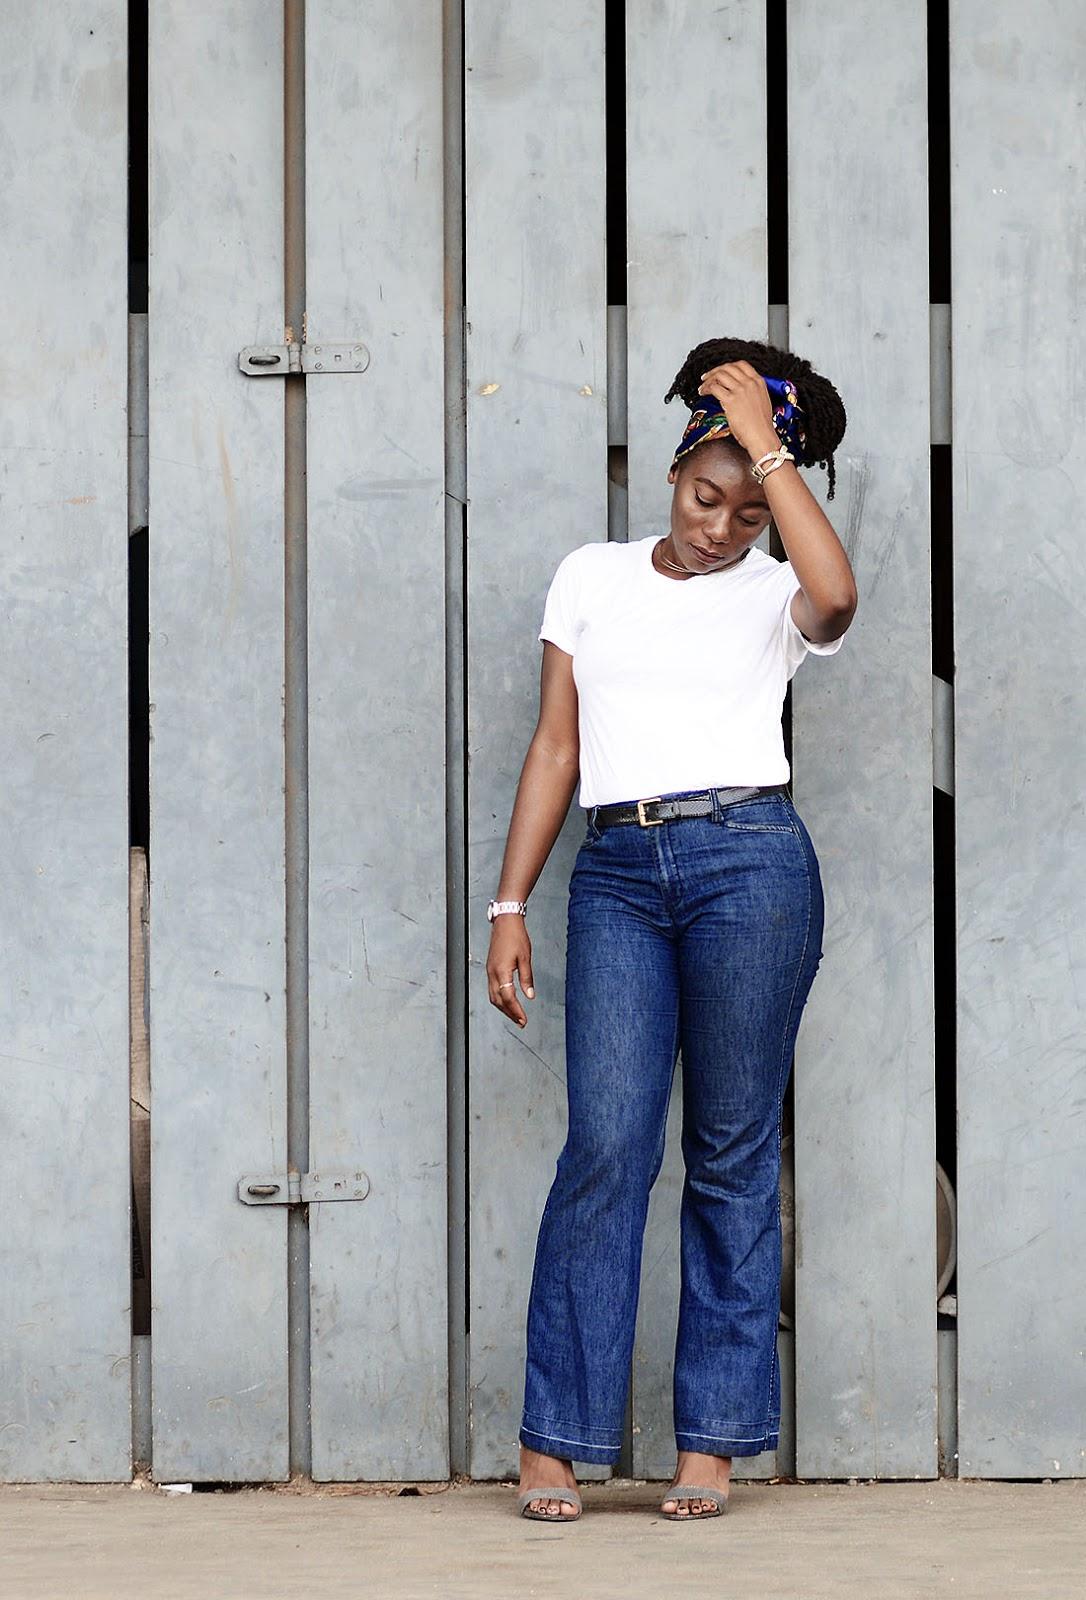 blue-retro-denim-jeans-white-tshirt